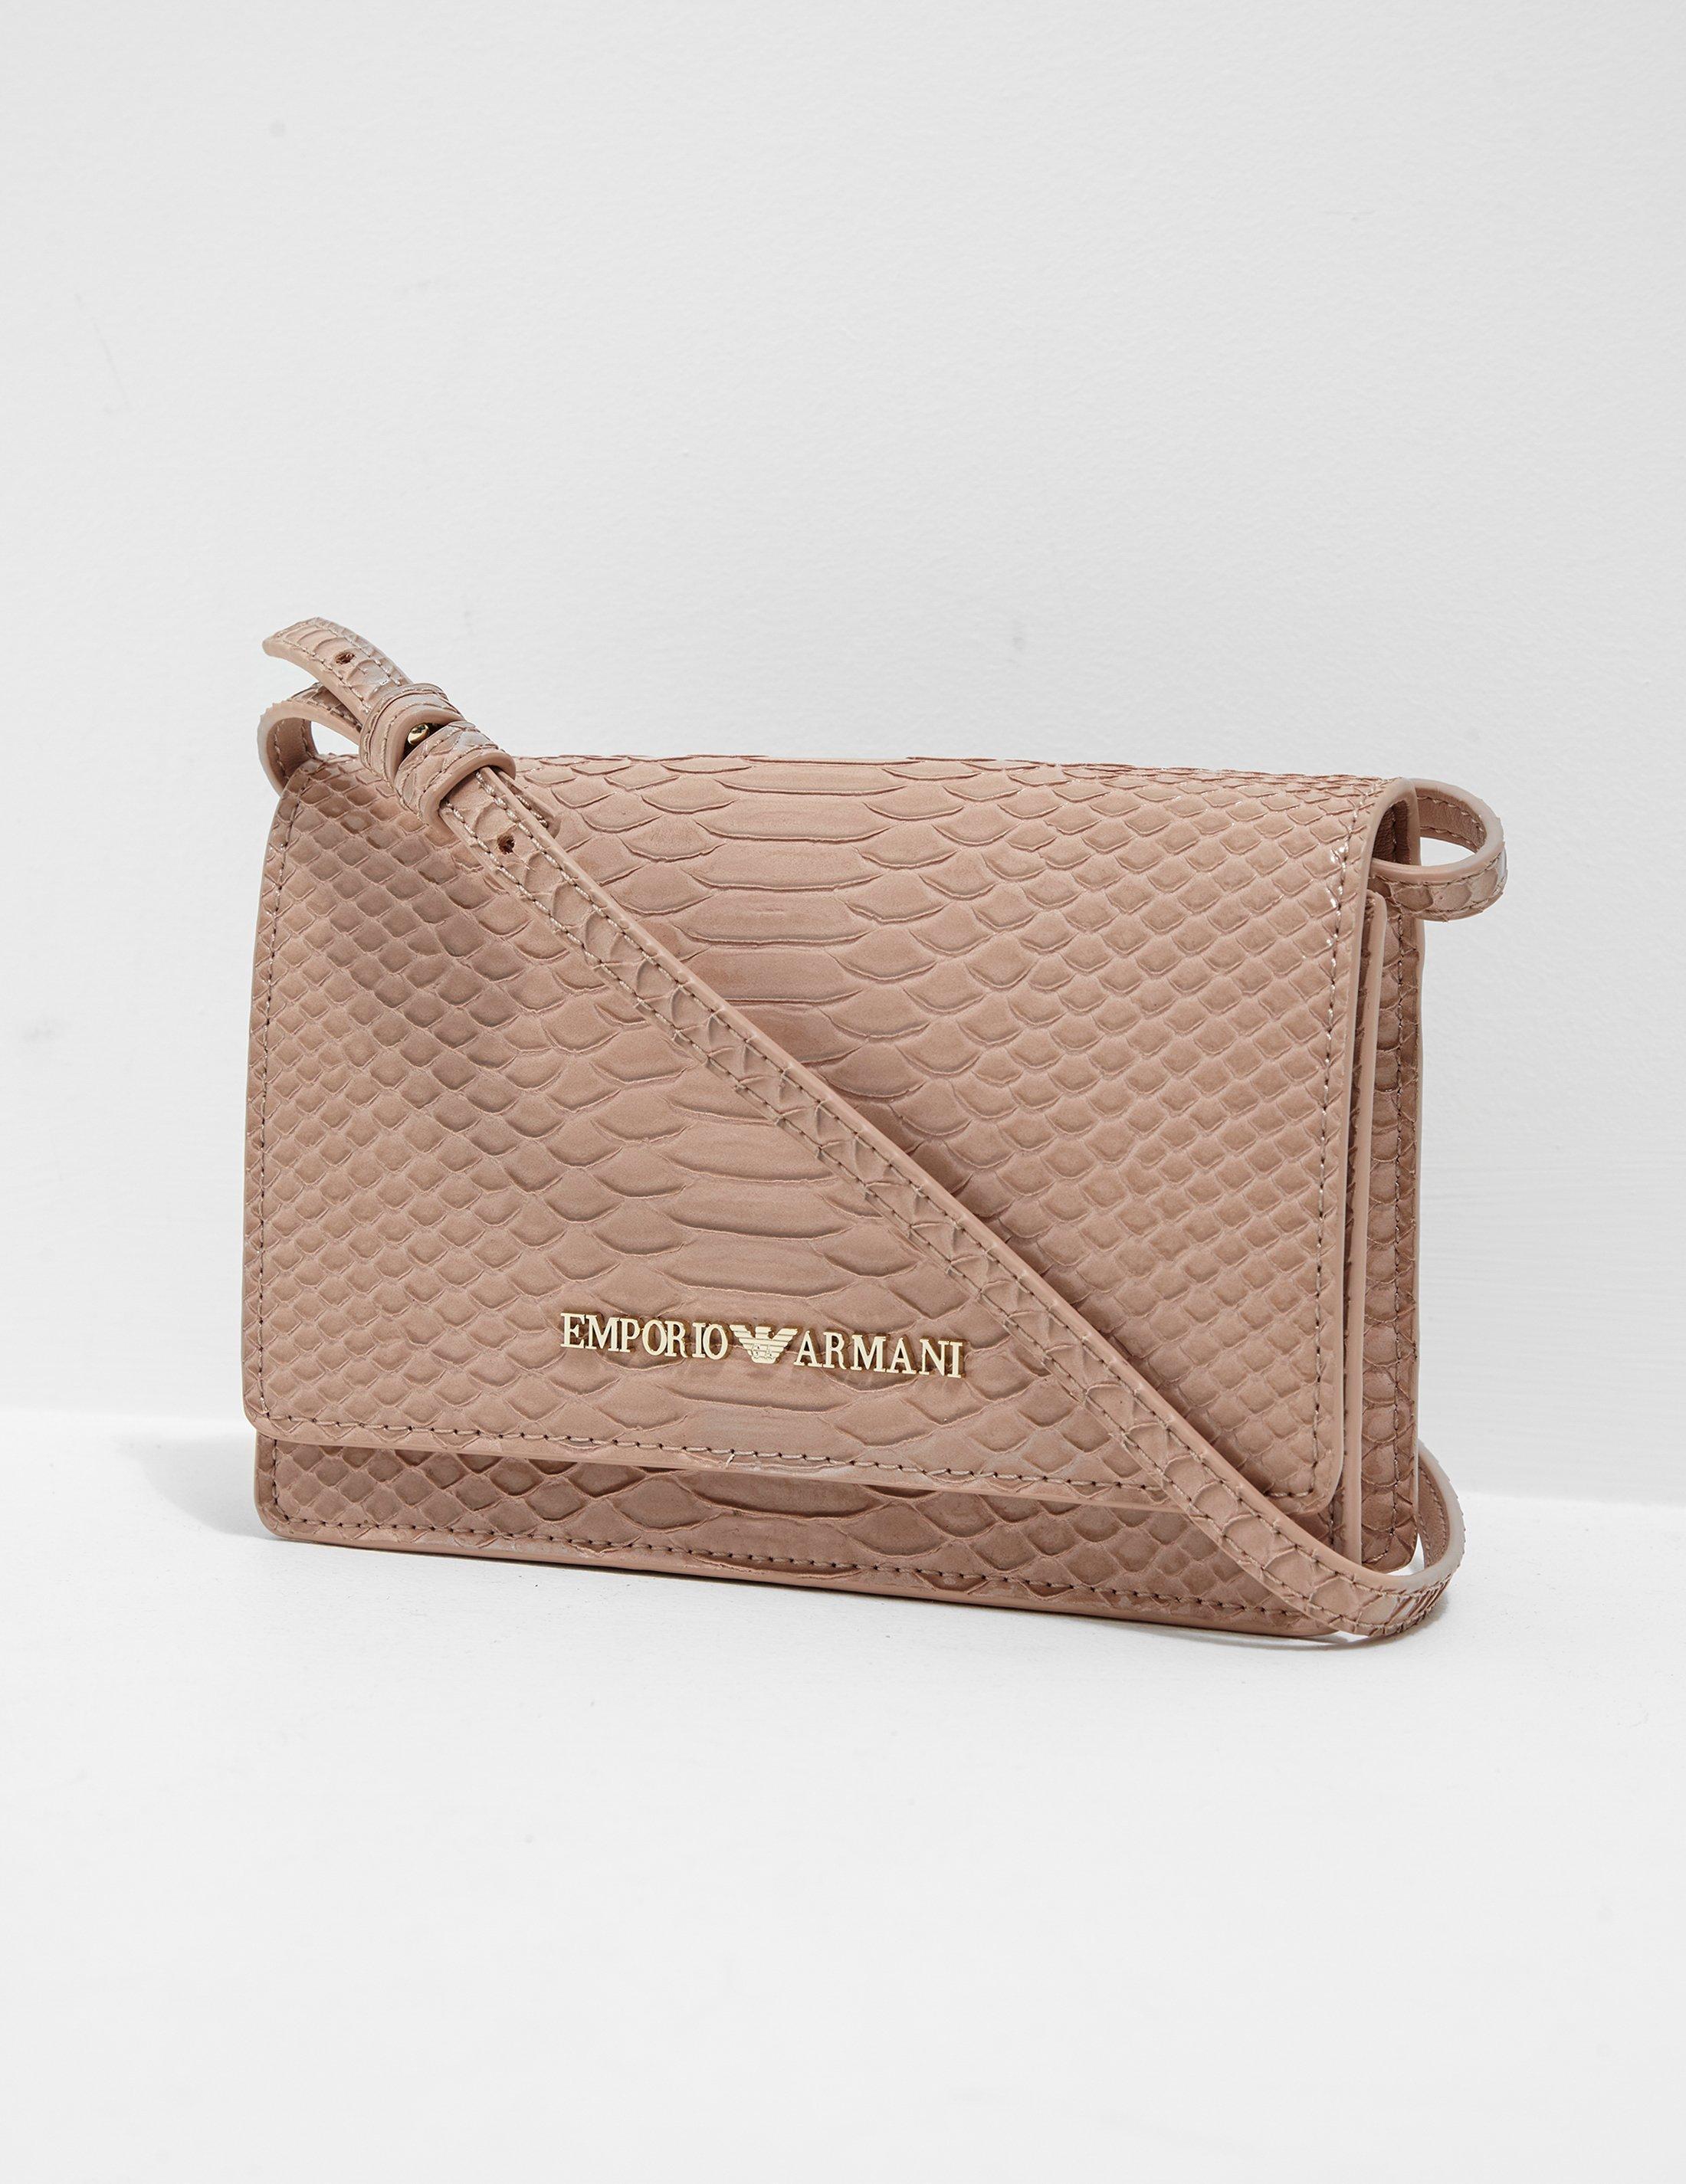 7acc94f8 Emporio Armani Womens Snakeskin Crossbody Bag Pink, Pink - Lyst